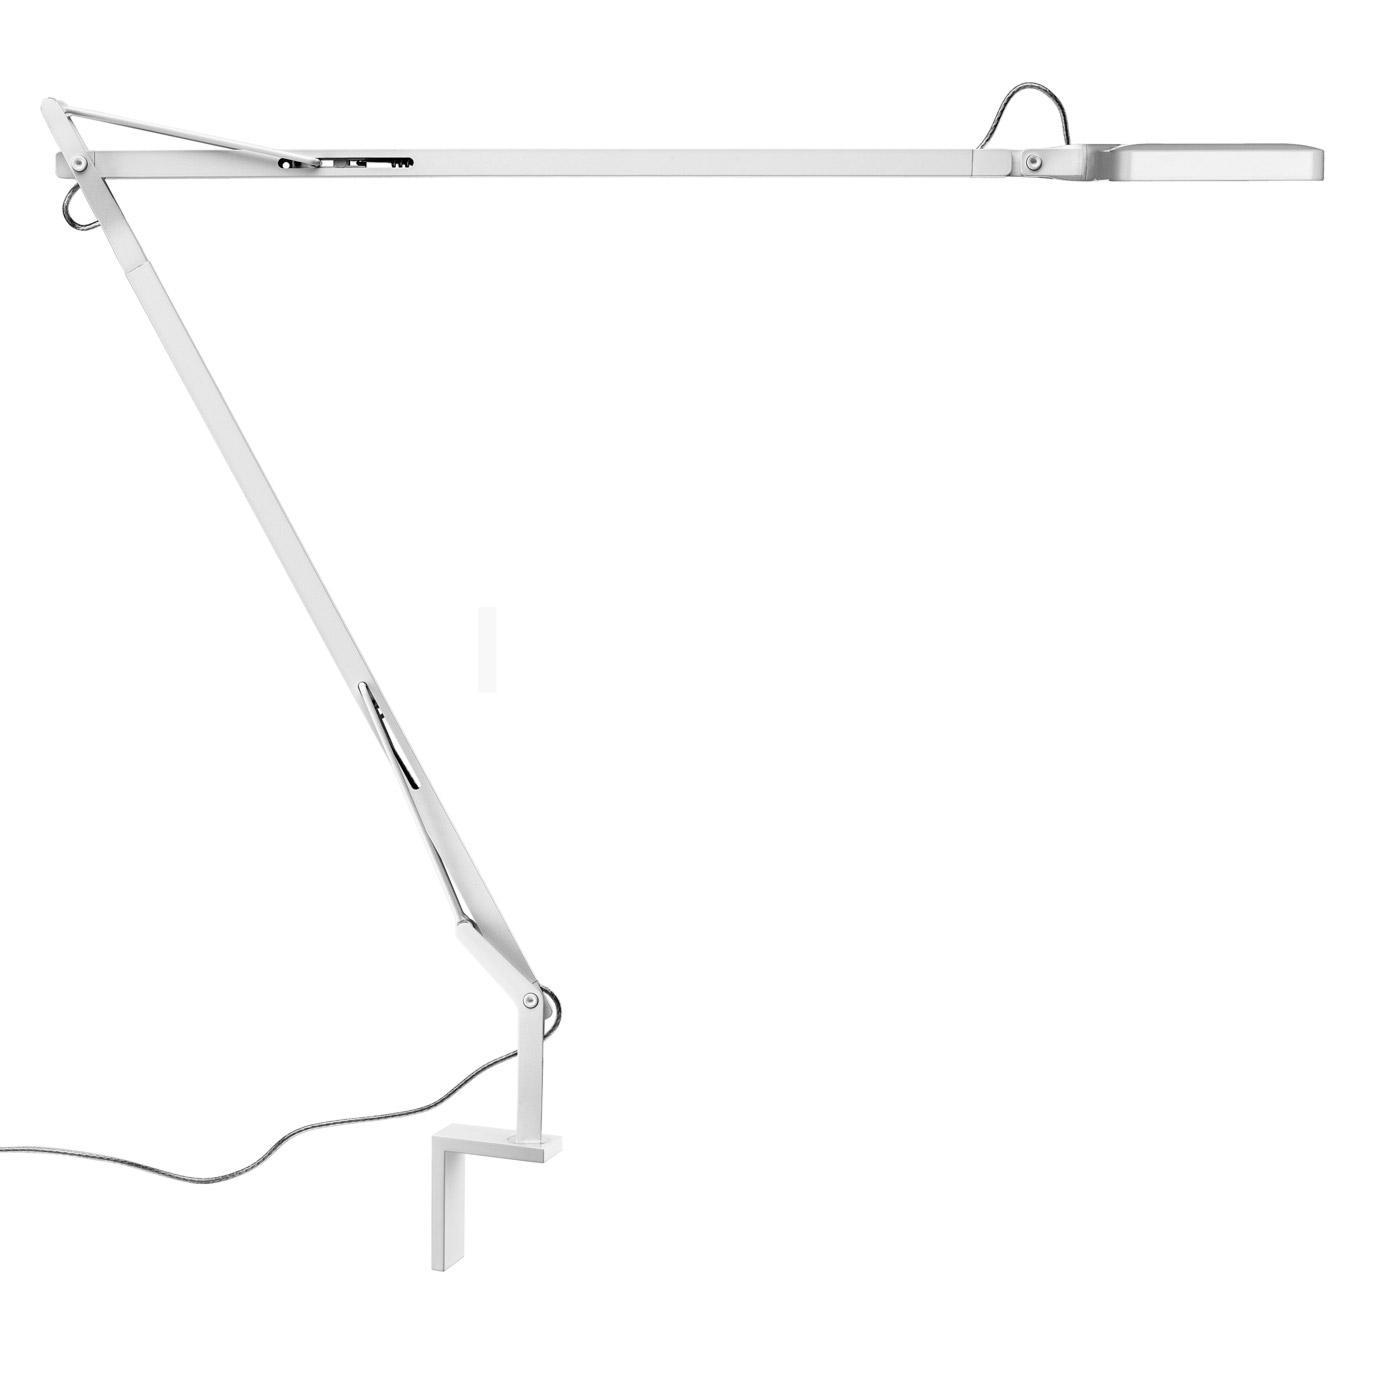 flos kelvin led lampe luminaire sur bras f3315030. Black Bedroom Furniture Sets. Home Design Ideas